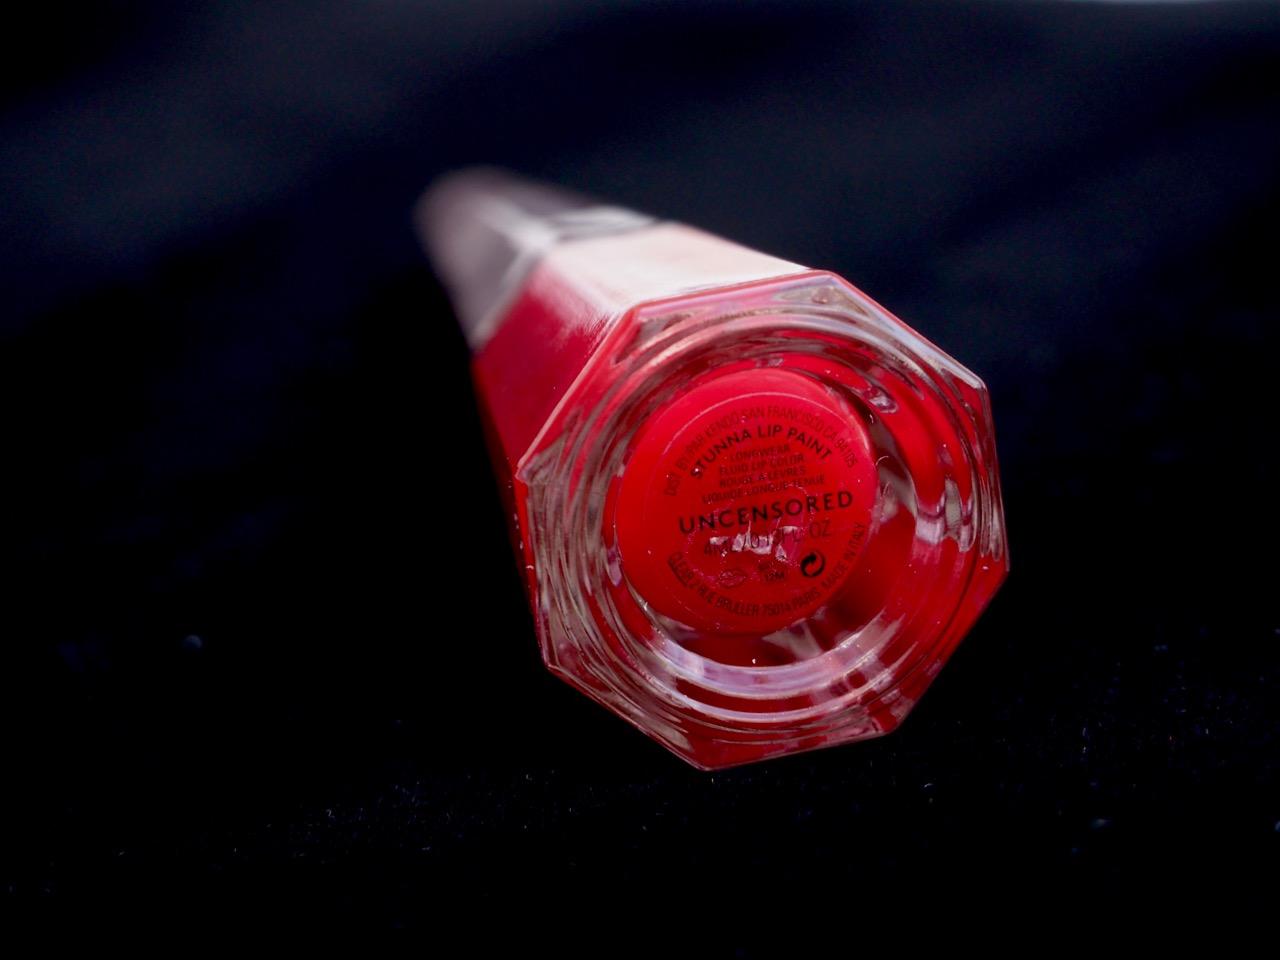 Fenty Beauty Stunna Lip Paint Uncensored